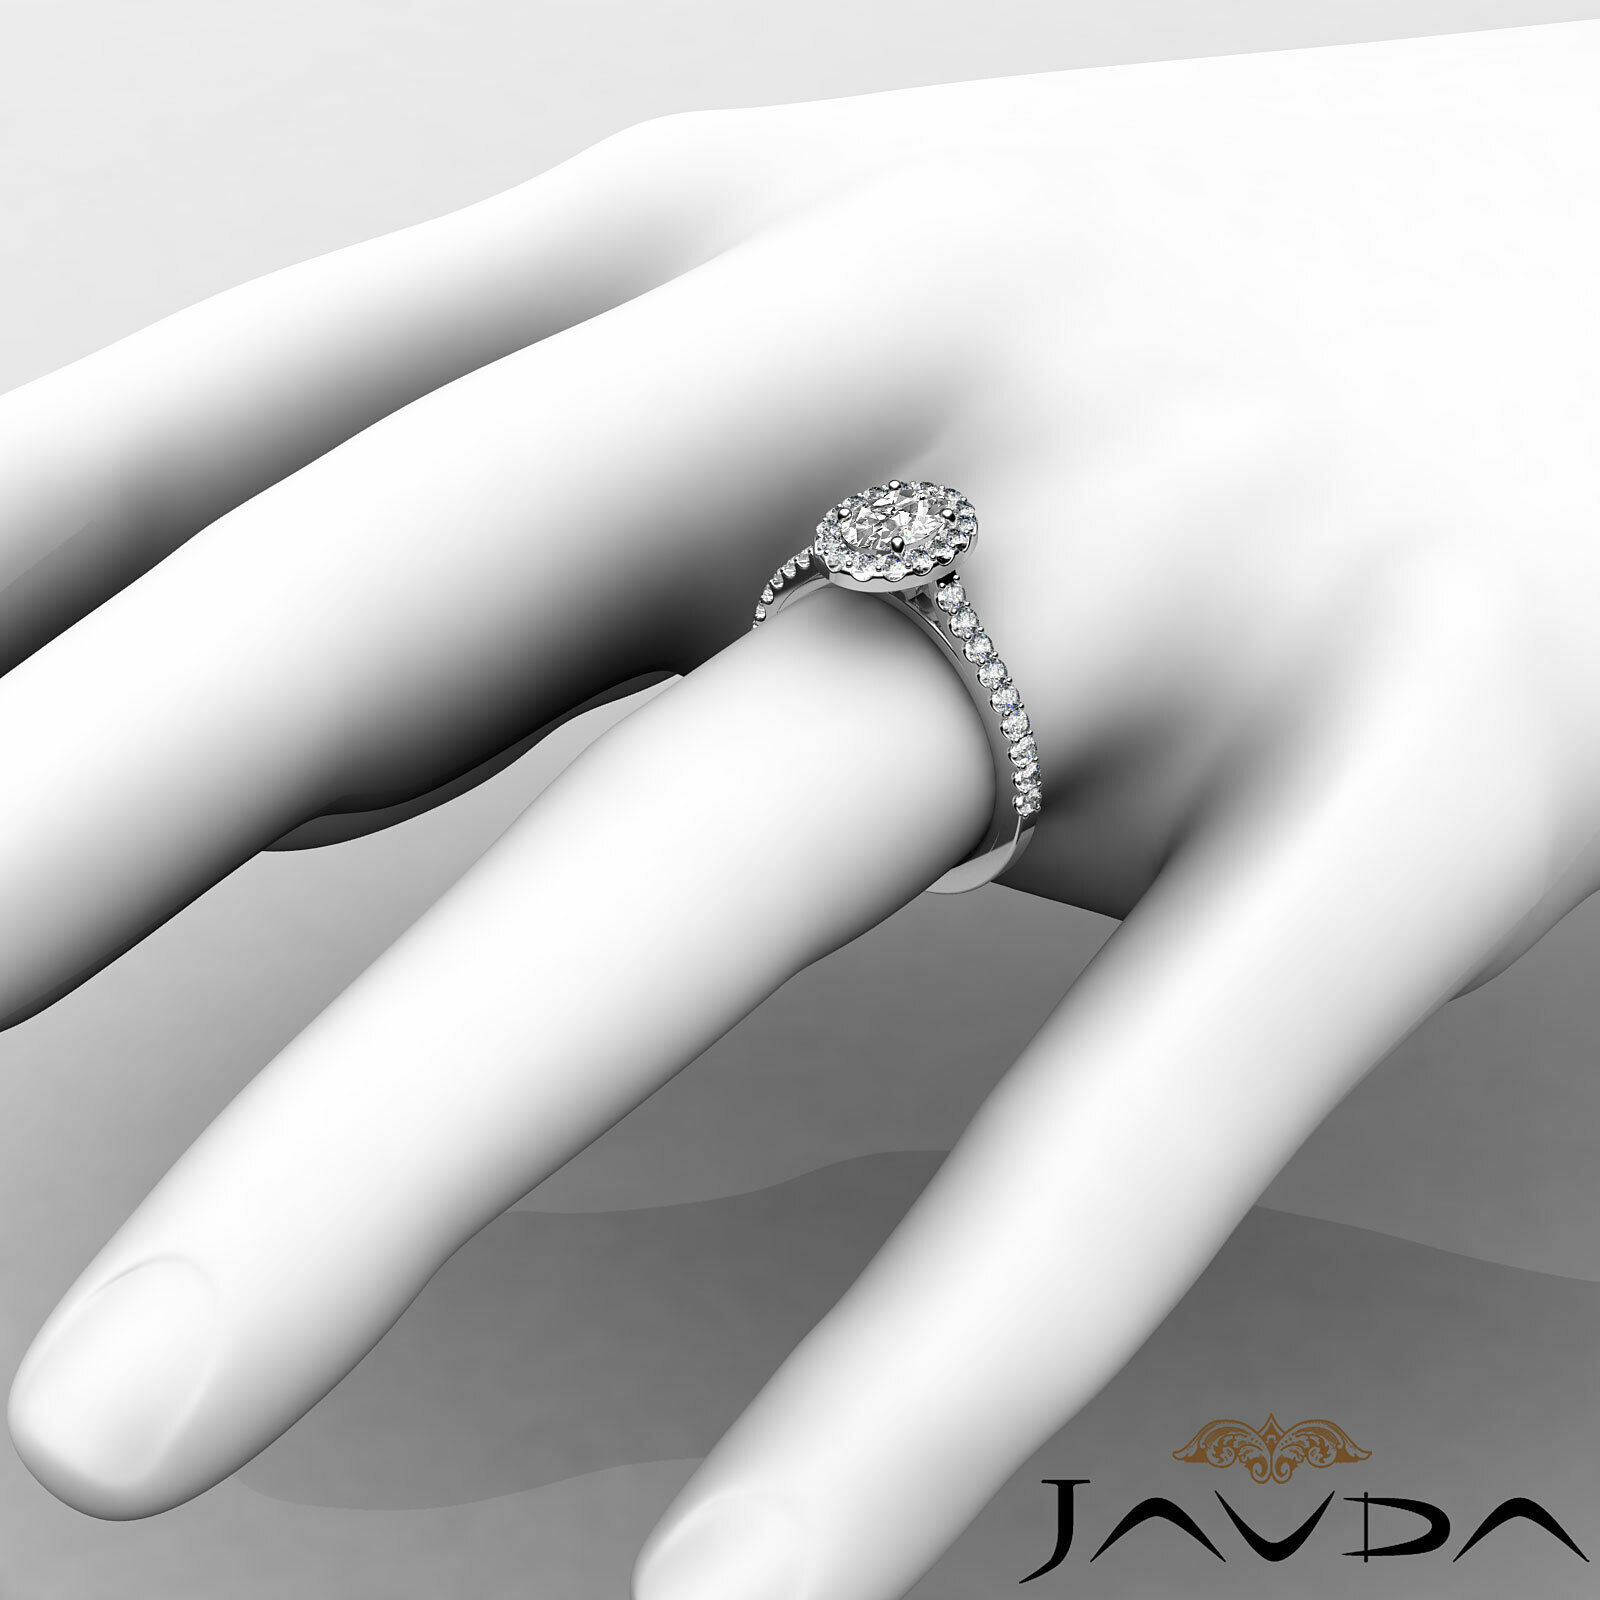 1.6ctw Prong Setting Oval Diamond Engagement Ring GIA H-VS1 White Gold Women New 4